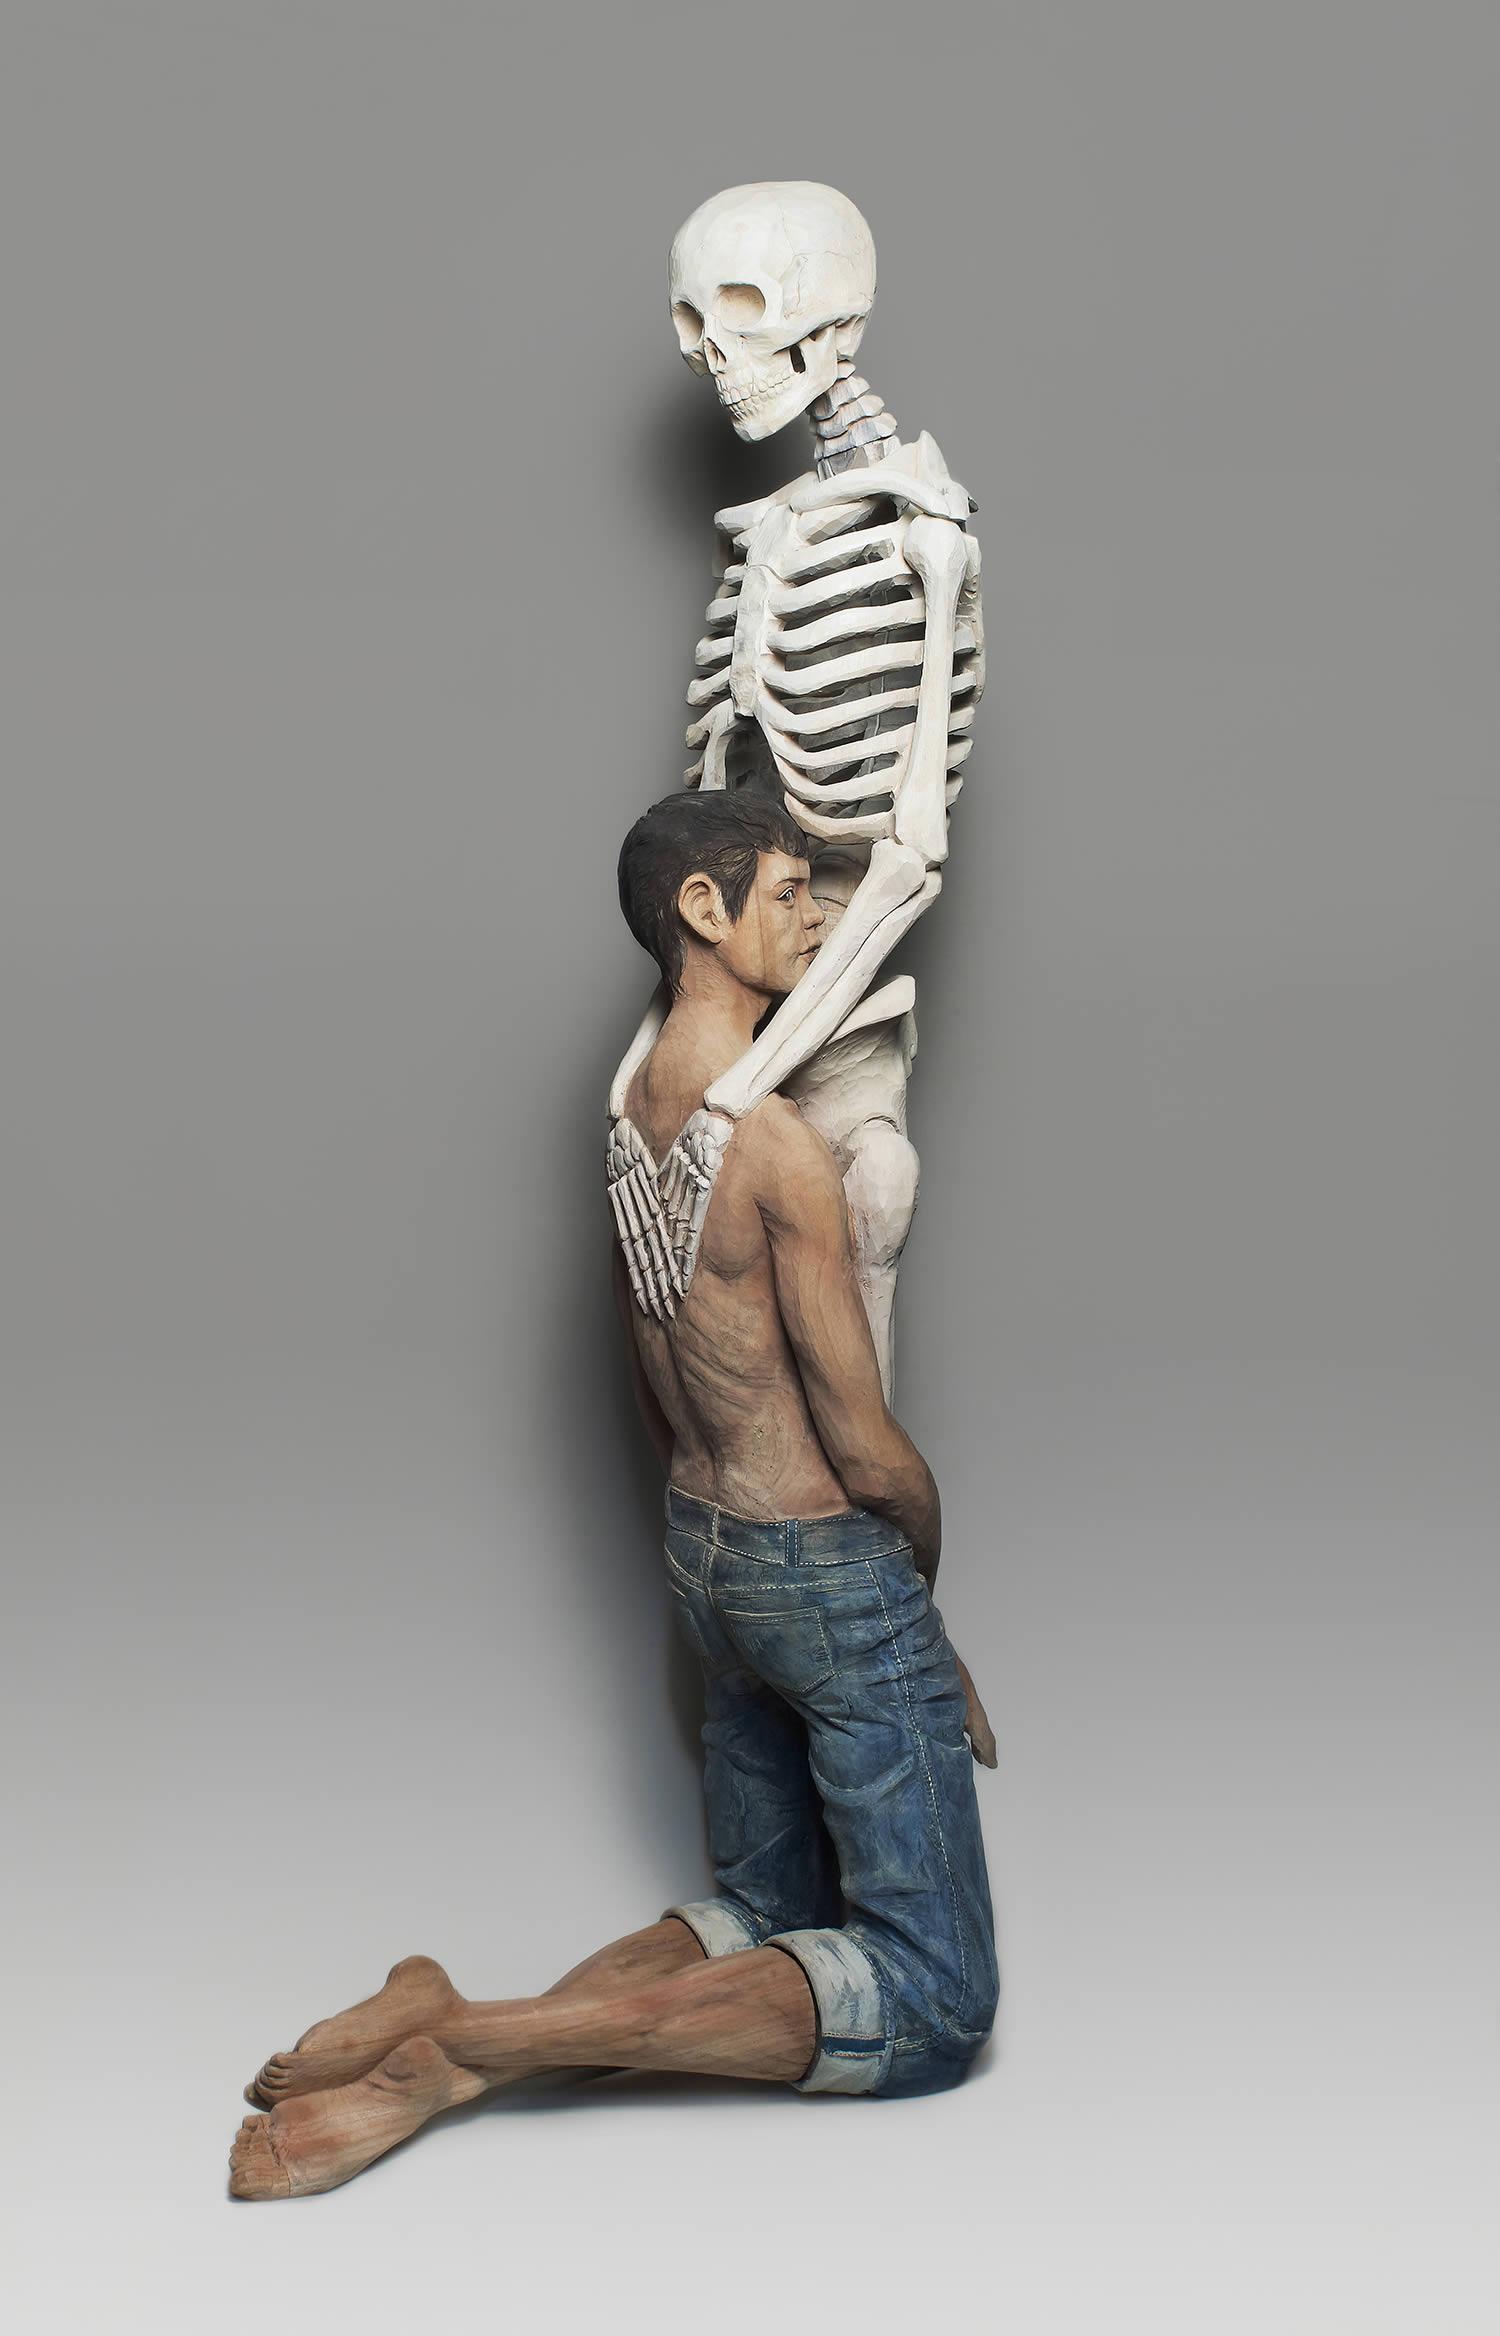 skeleton and man, sculpture by Yoshitoshi Kanemaki